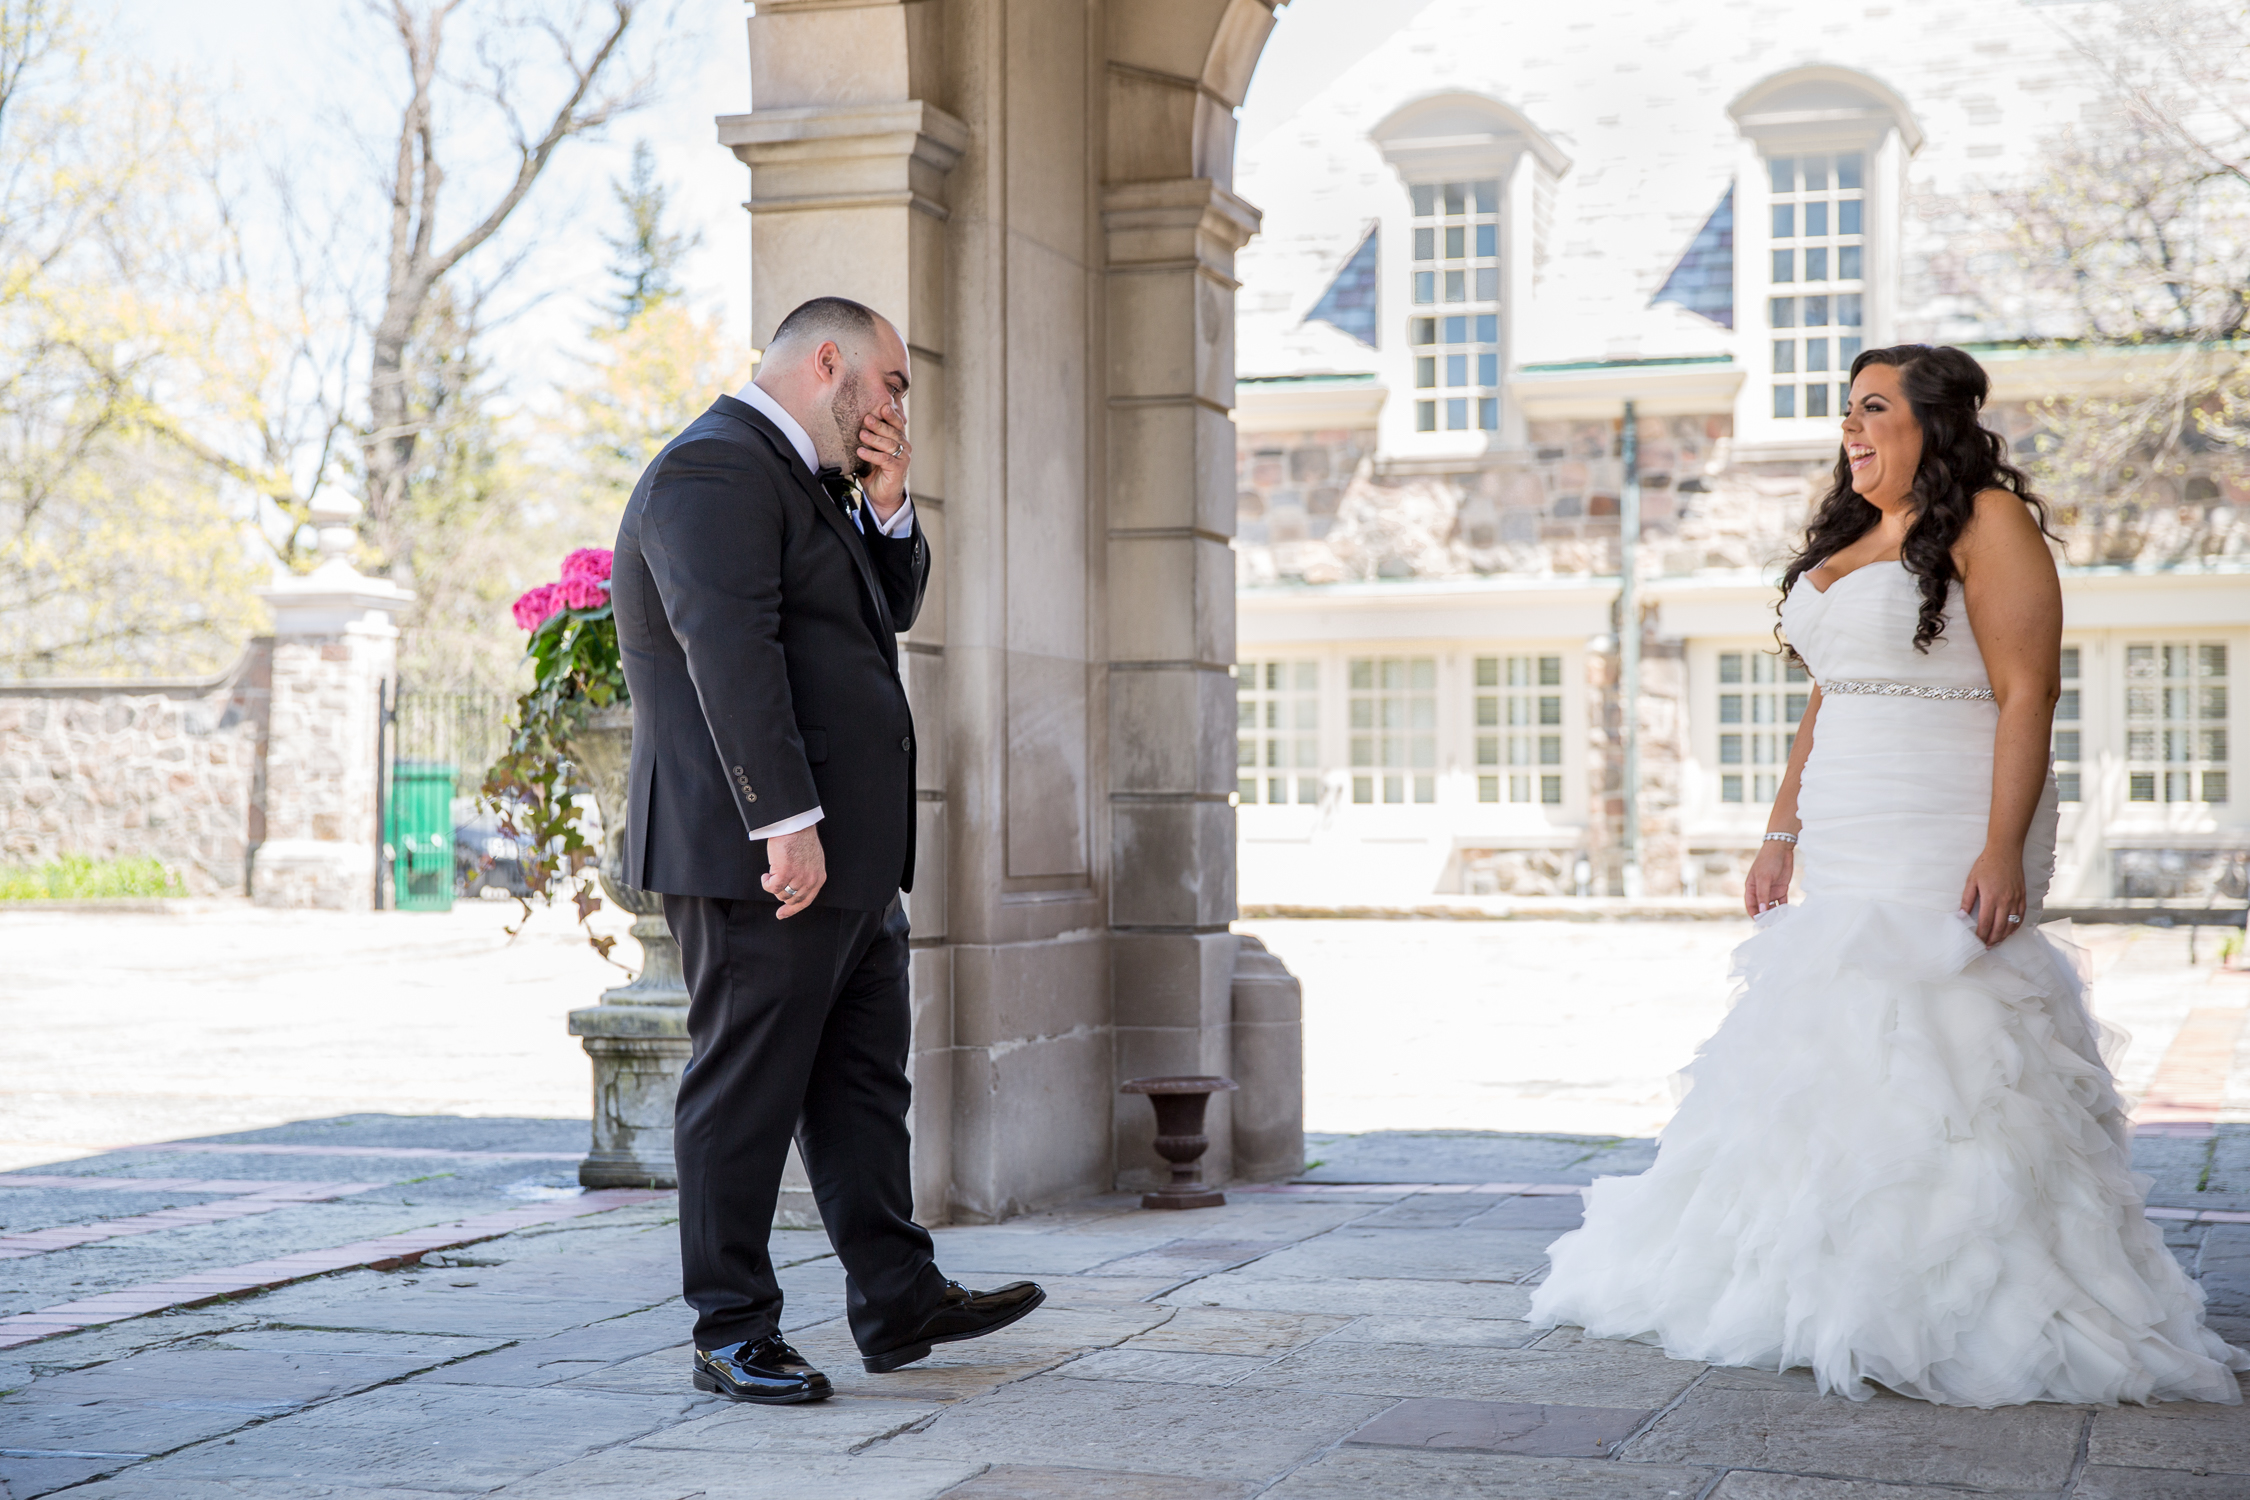 Peter-and-Marie-Wedding-Fontana-Primavera-Graydon-Hall-Manor-Toronto-Ontario-Canada-0014.jpg